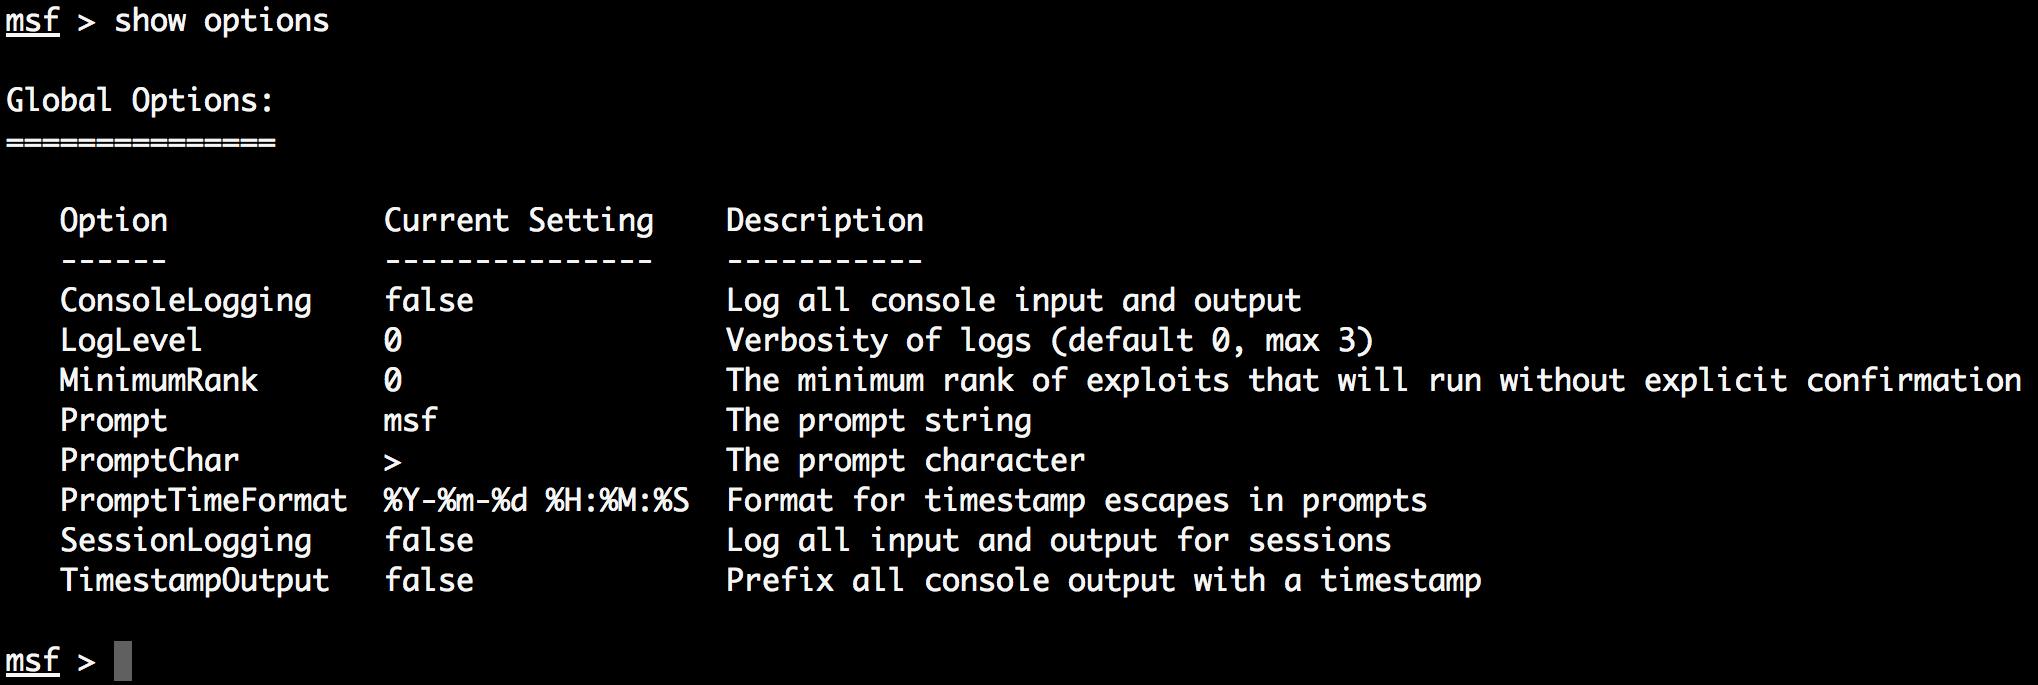 Metasploit logging - Metasploit Penetration Testing Cookbook